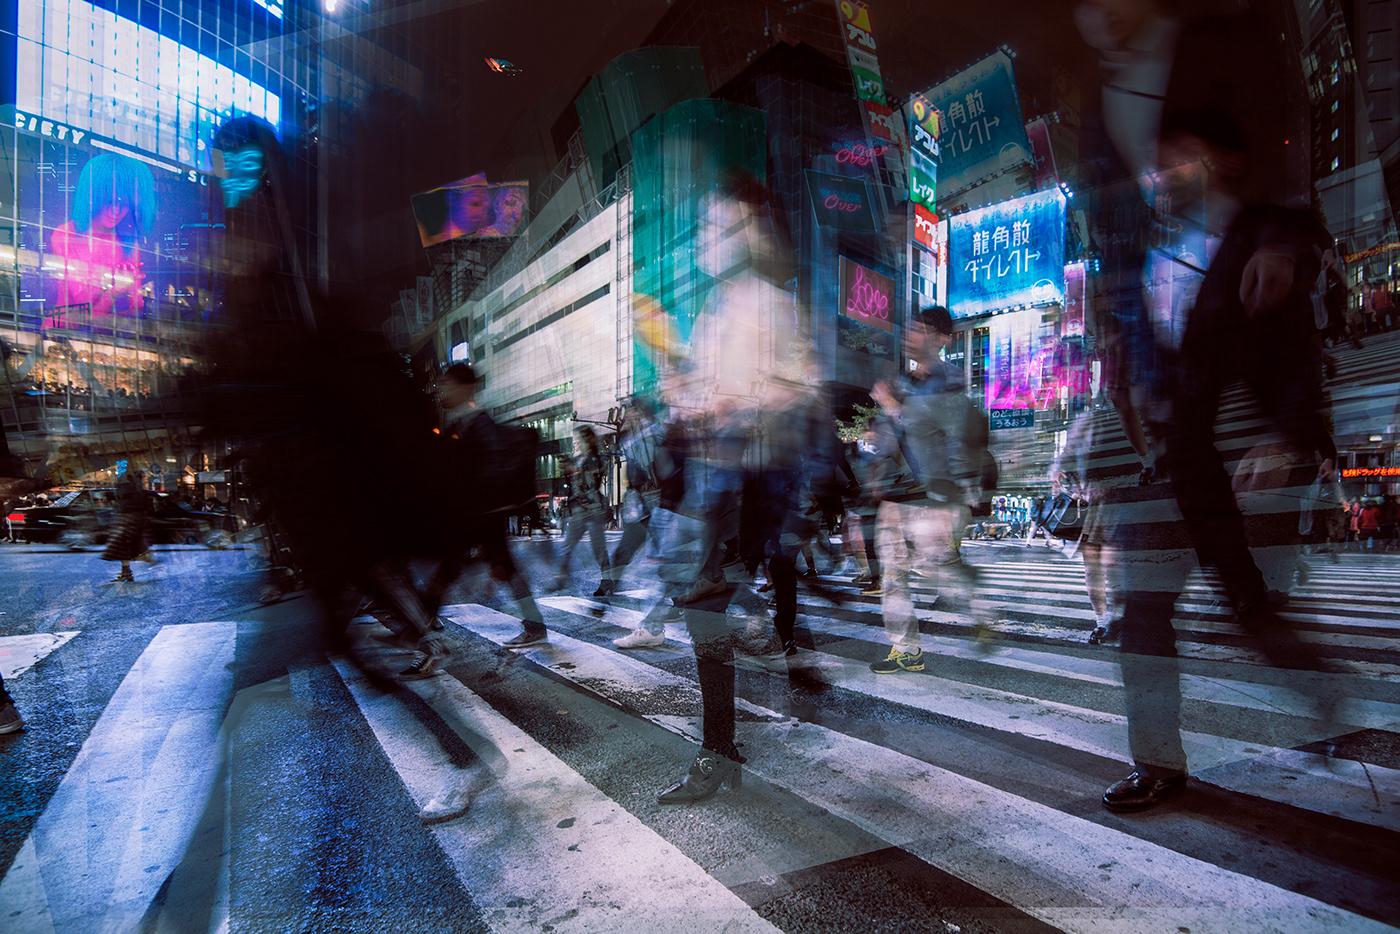 tokyio cinematic future crowd night